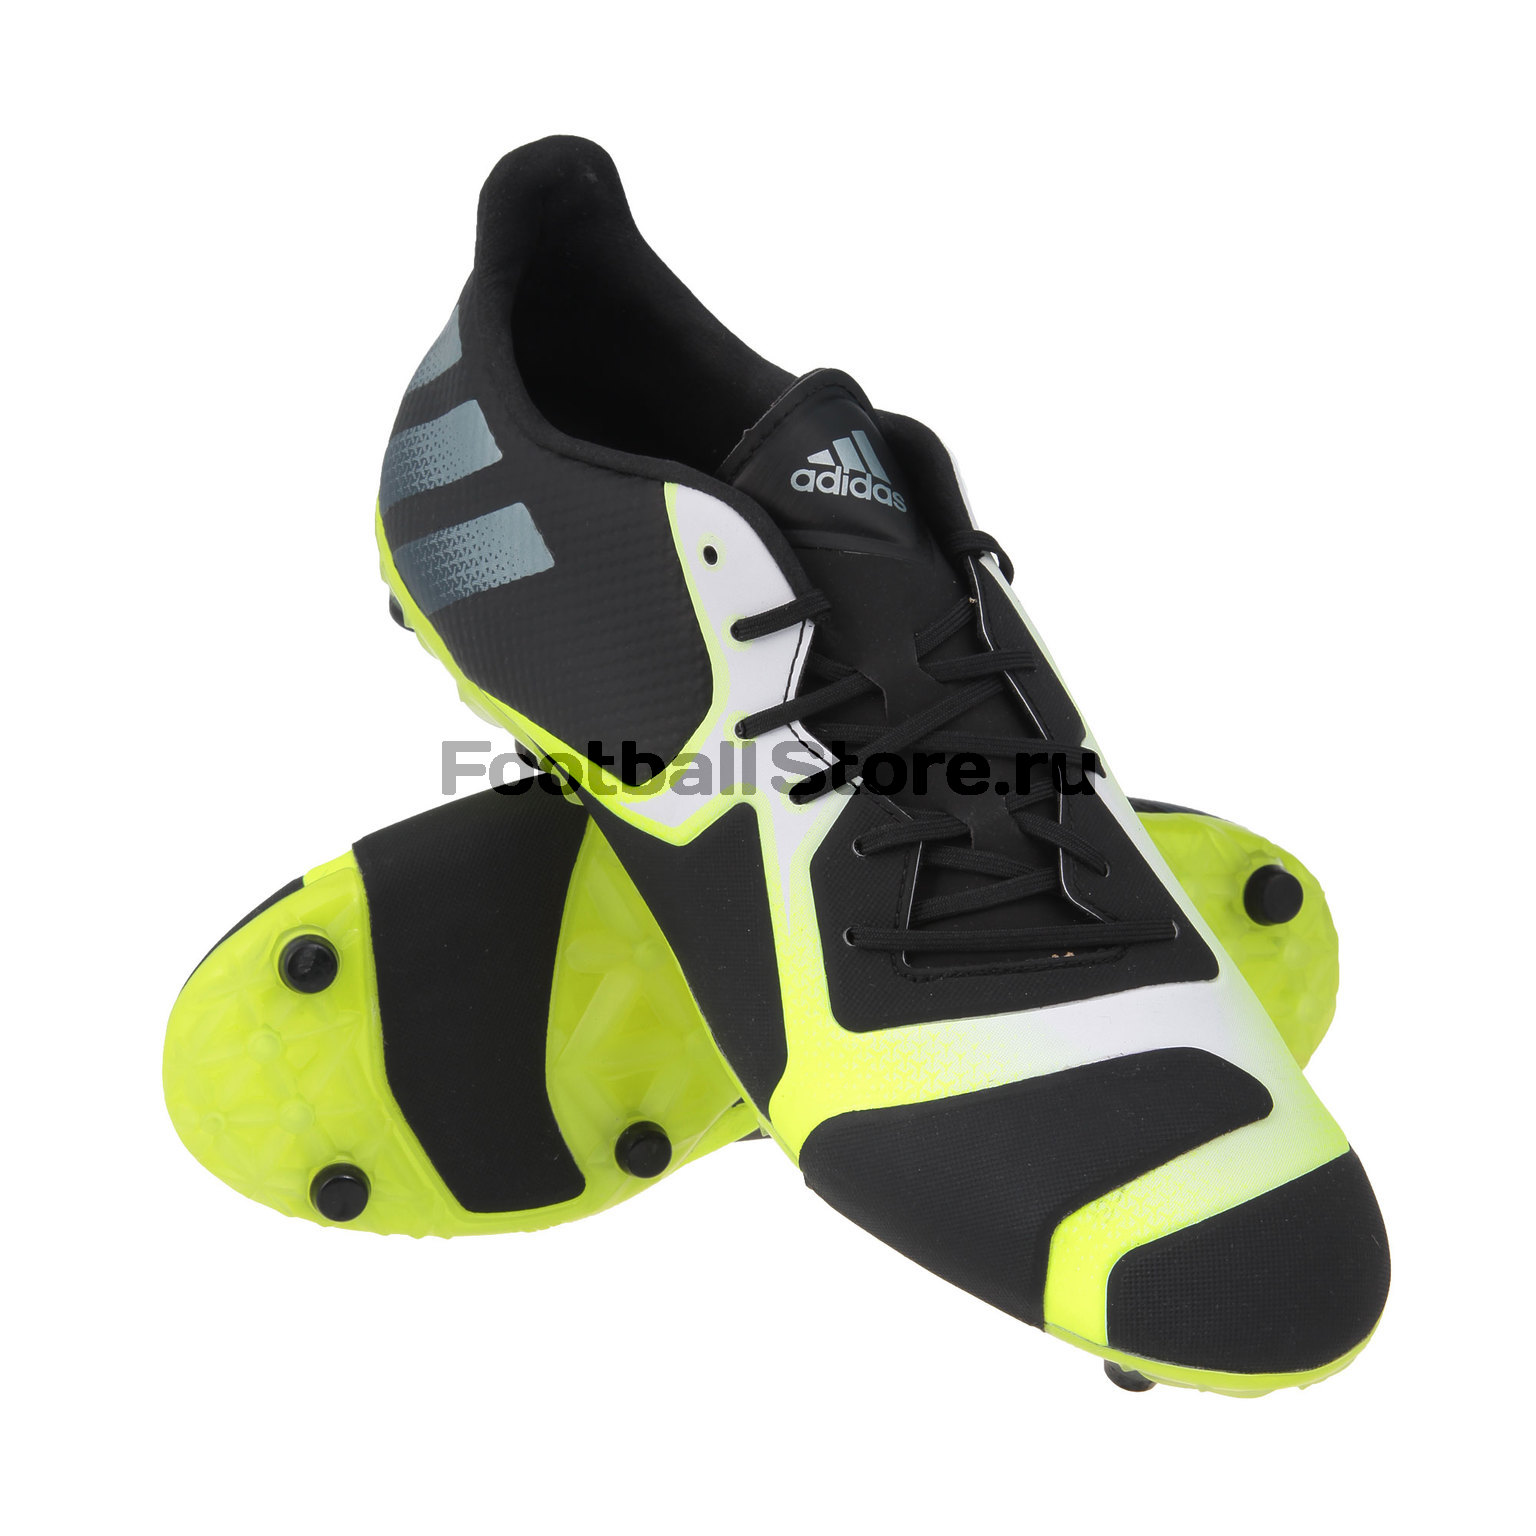 Бутсы Adidas Ace 16+ TKRZ S31928 adidas adidas ace replique goalkeeper gloves